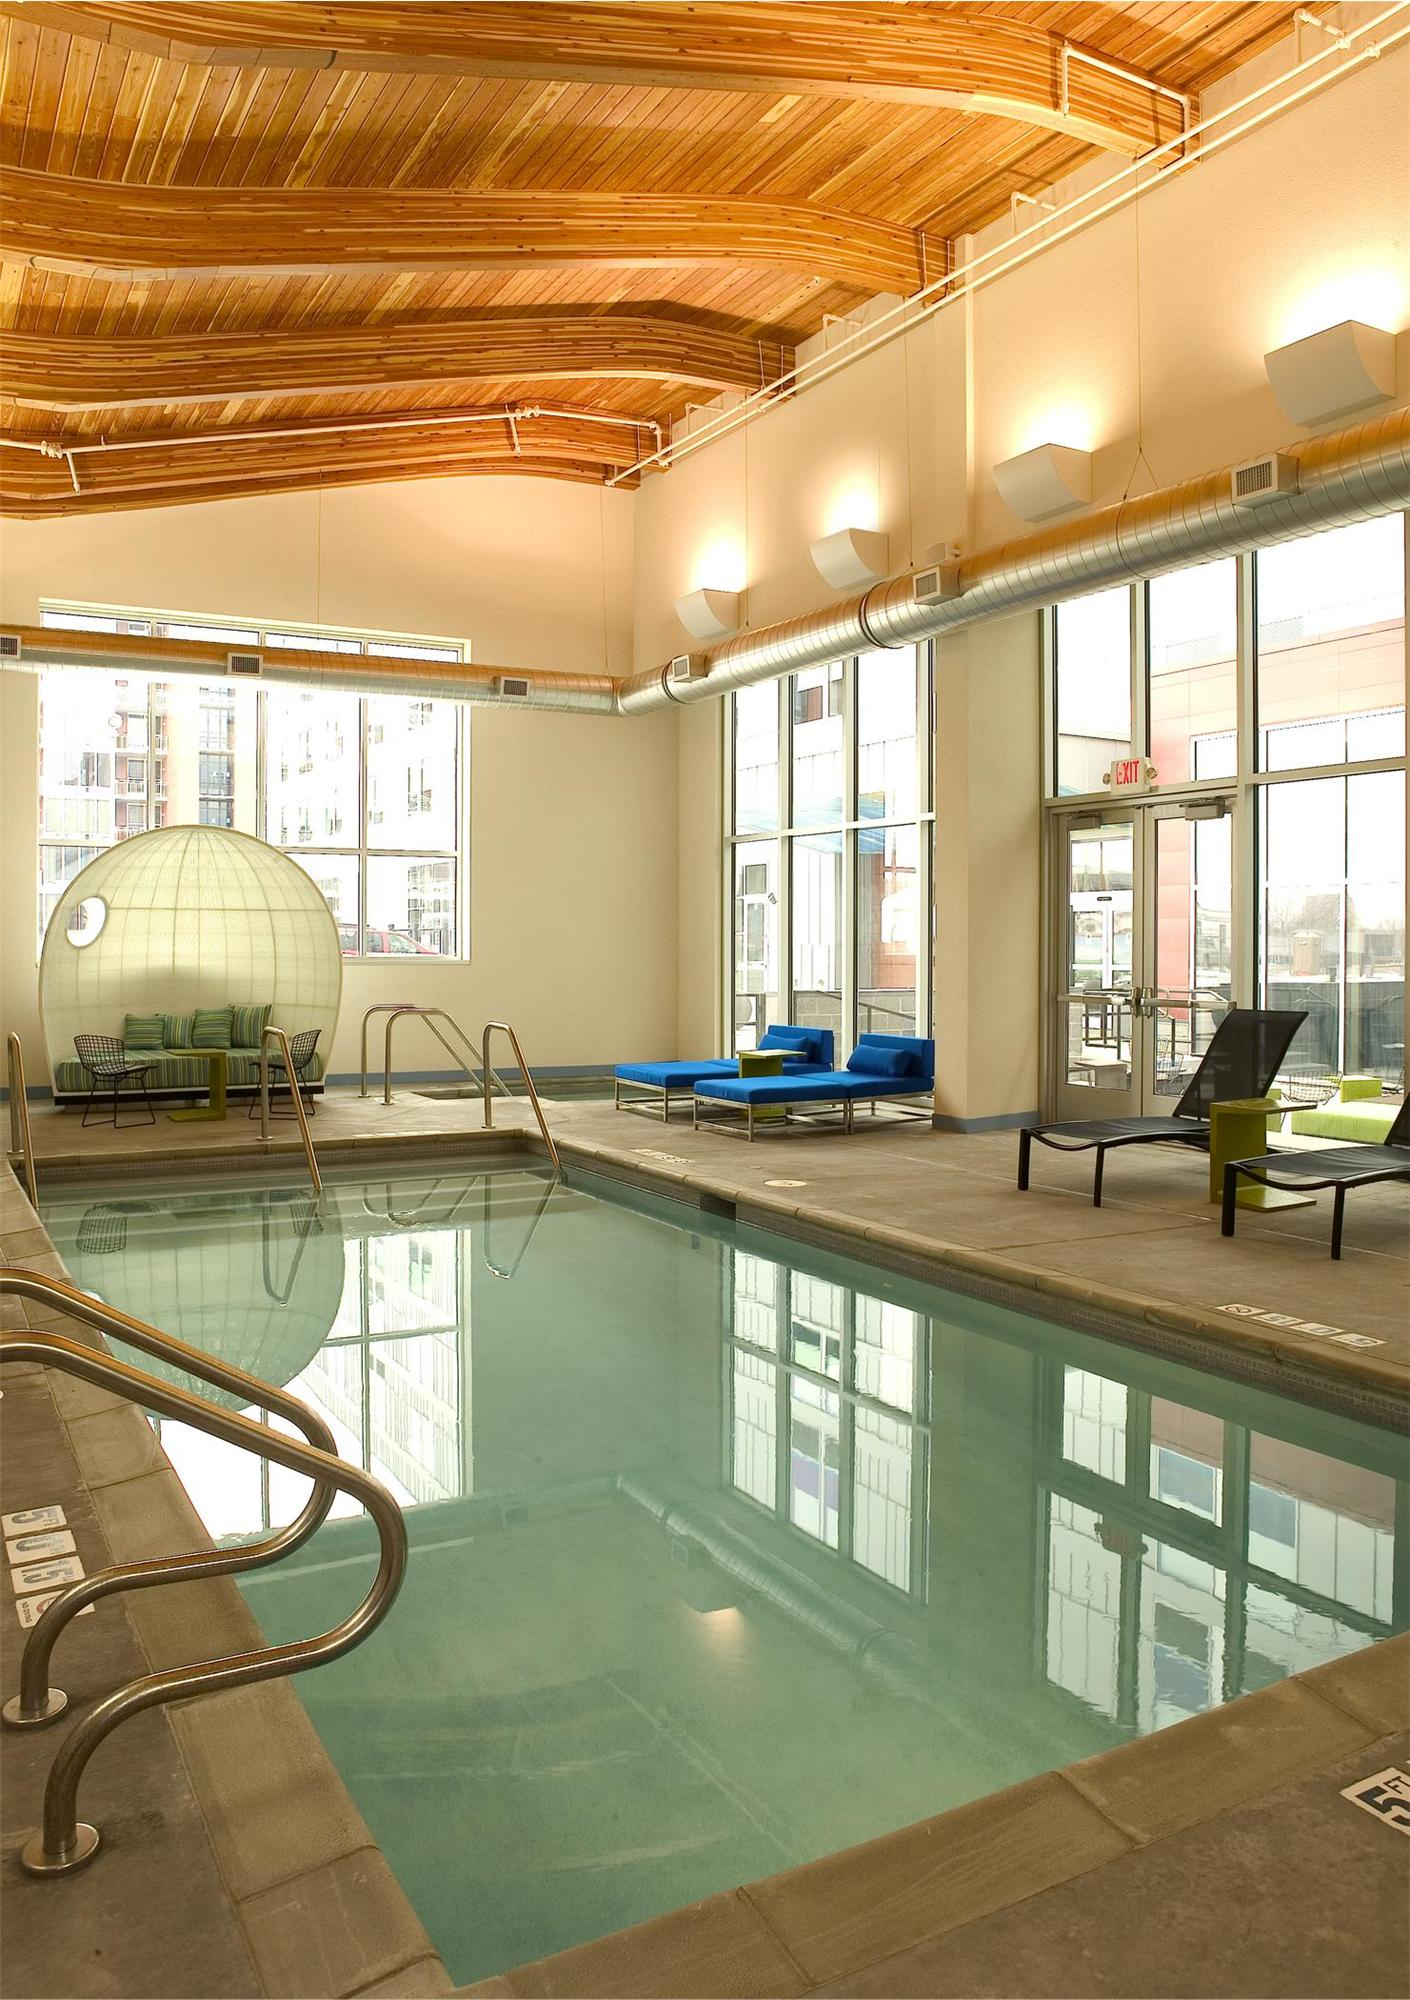 Pool area in the Aloft Hotel in Minneapolis, MN